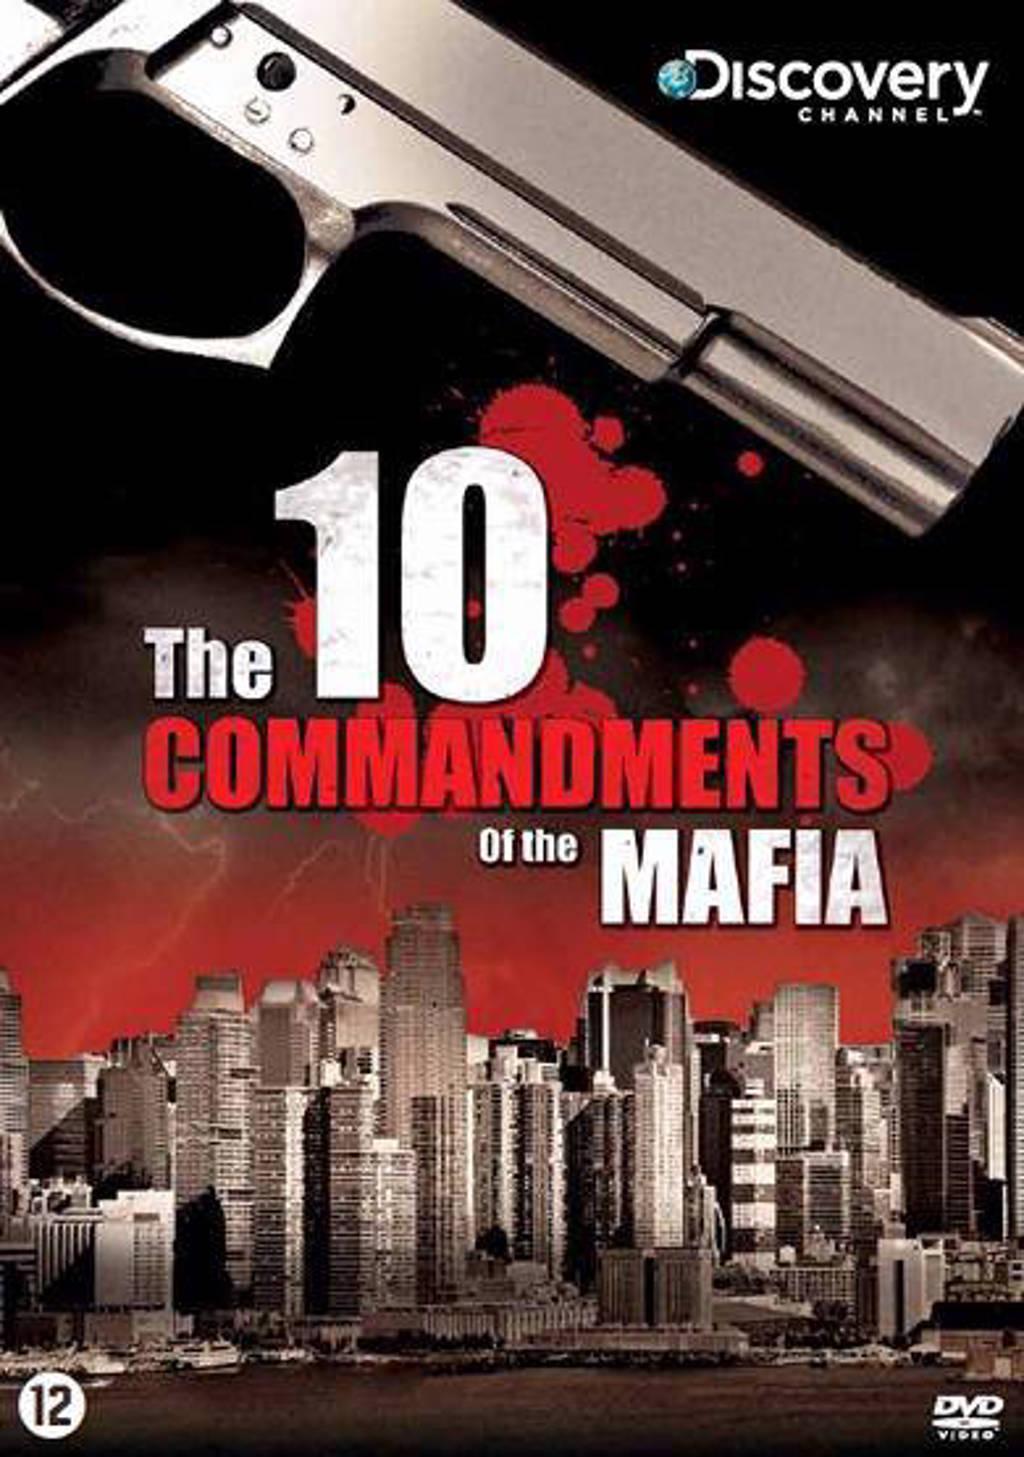 10 commandments of the mafia (DVD)